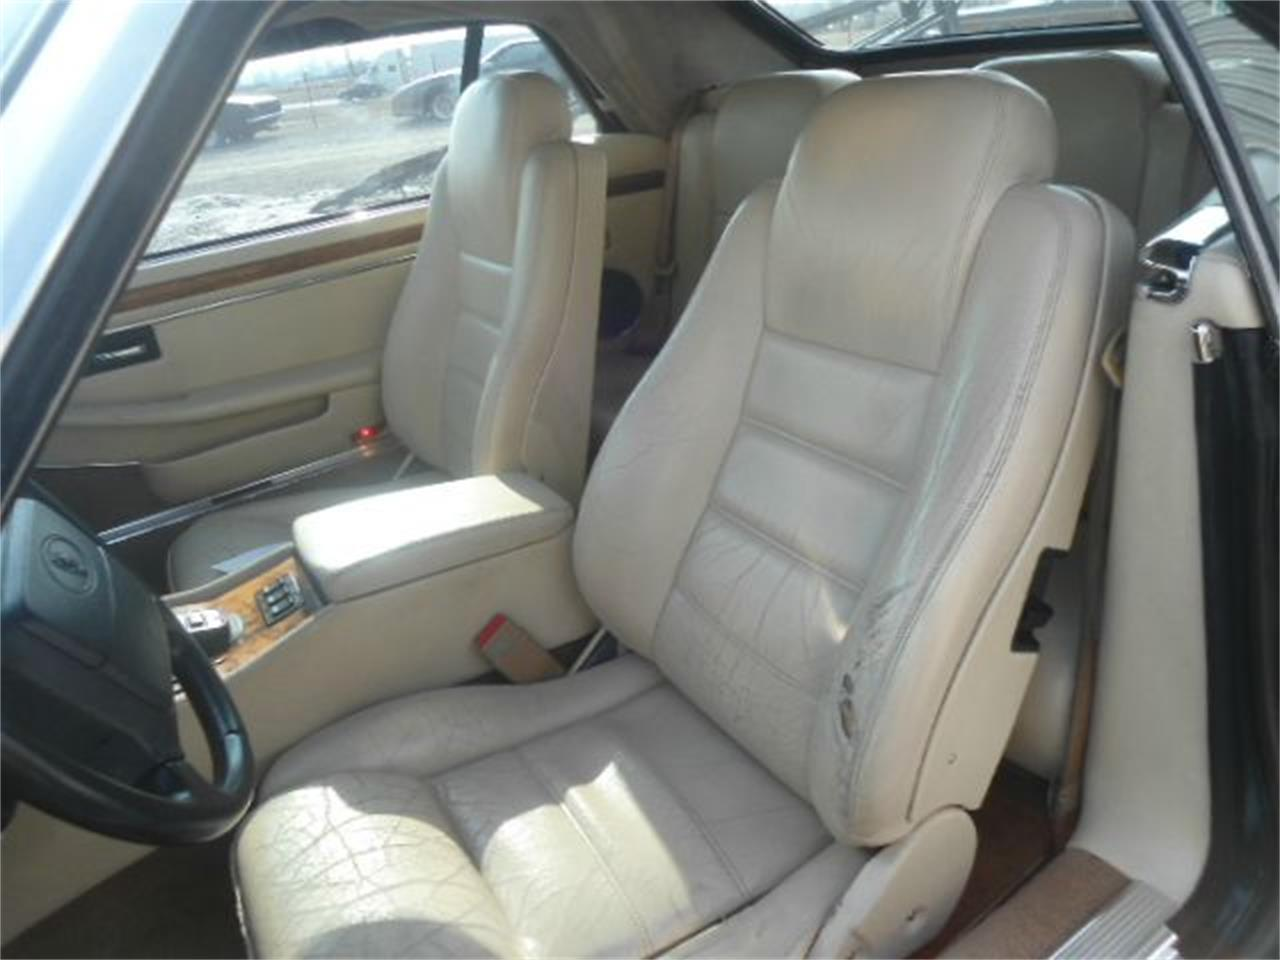 Large Picture of '95 Jaguar XJS located in Staunton Illinois - $8,950.00 - K499